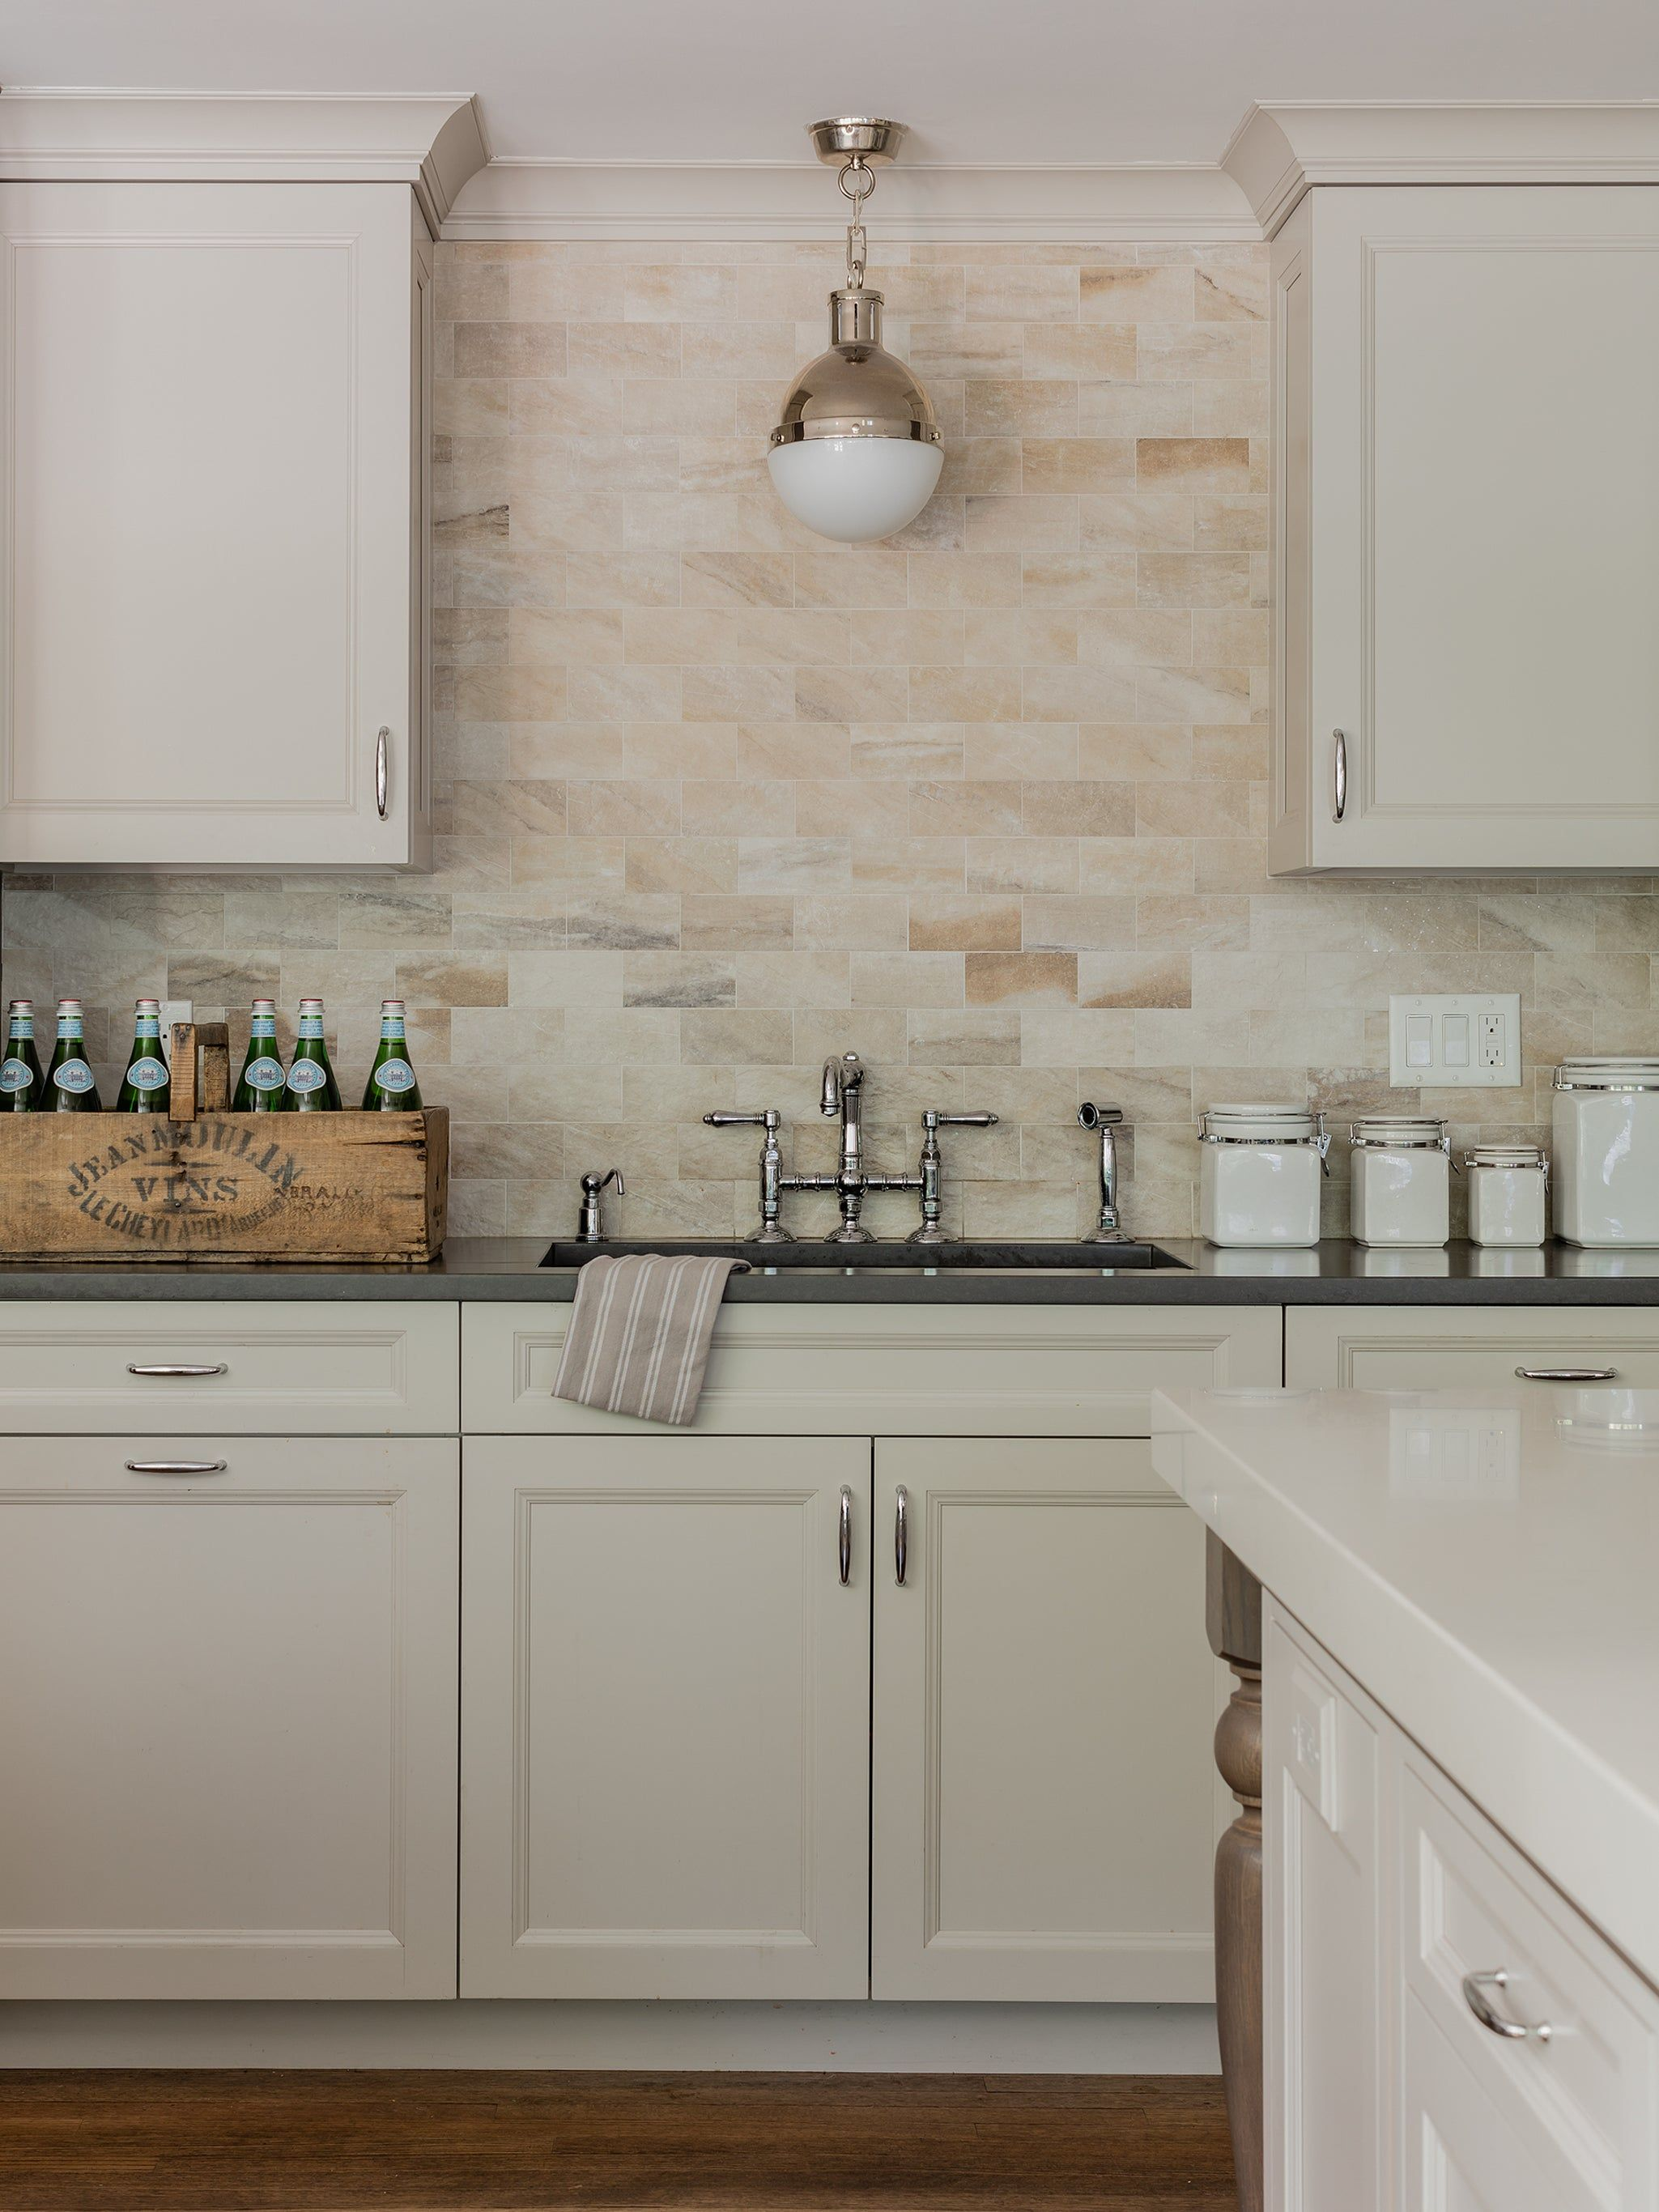 This Old House By Robin Gannon Interiors On 1stdibs In 2020 Backsplash For White Cabinets Kitchen Design Backsplash Tile Design